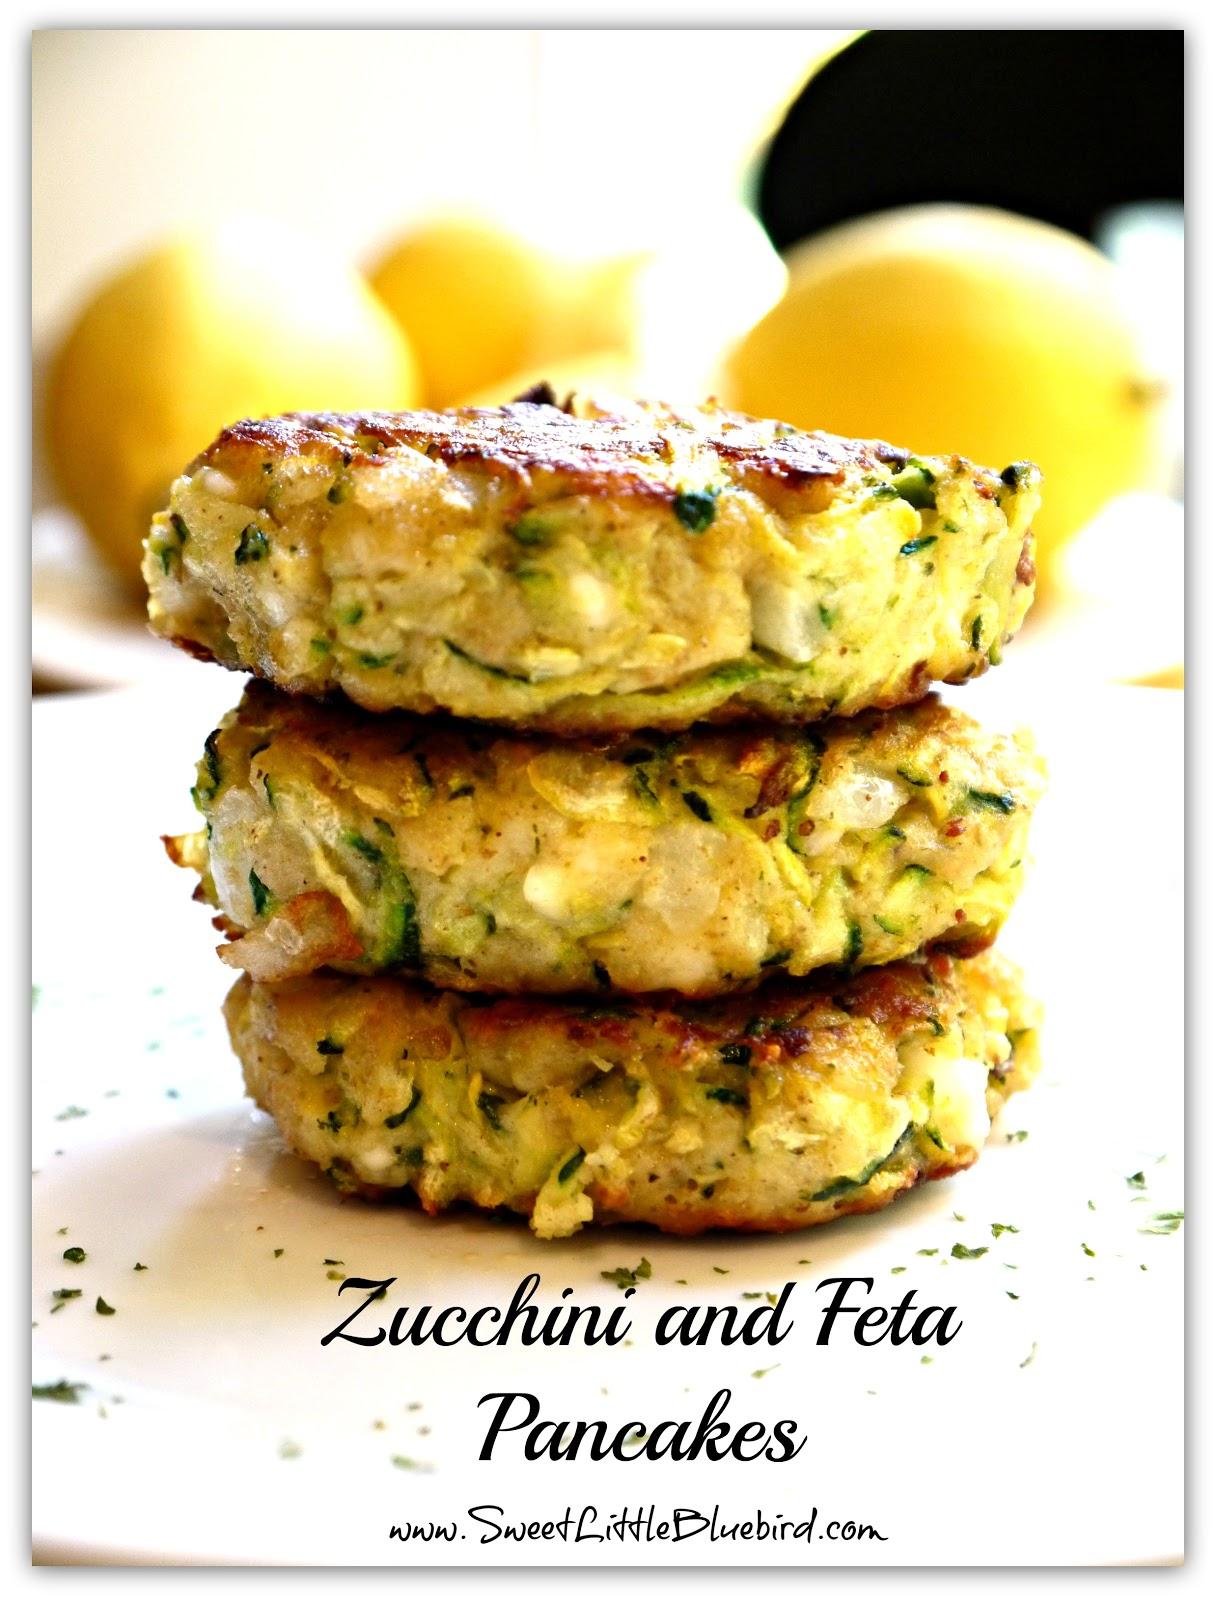 Sweet Little Bluebird: Zucchini and Feta Pancakes